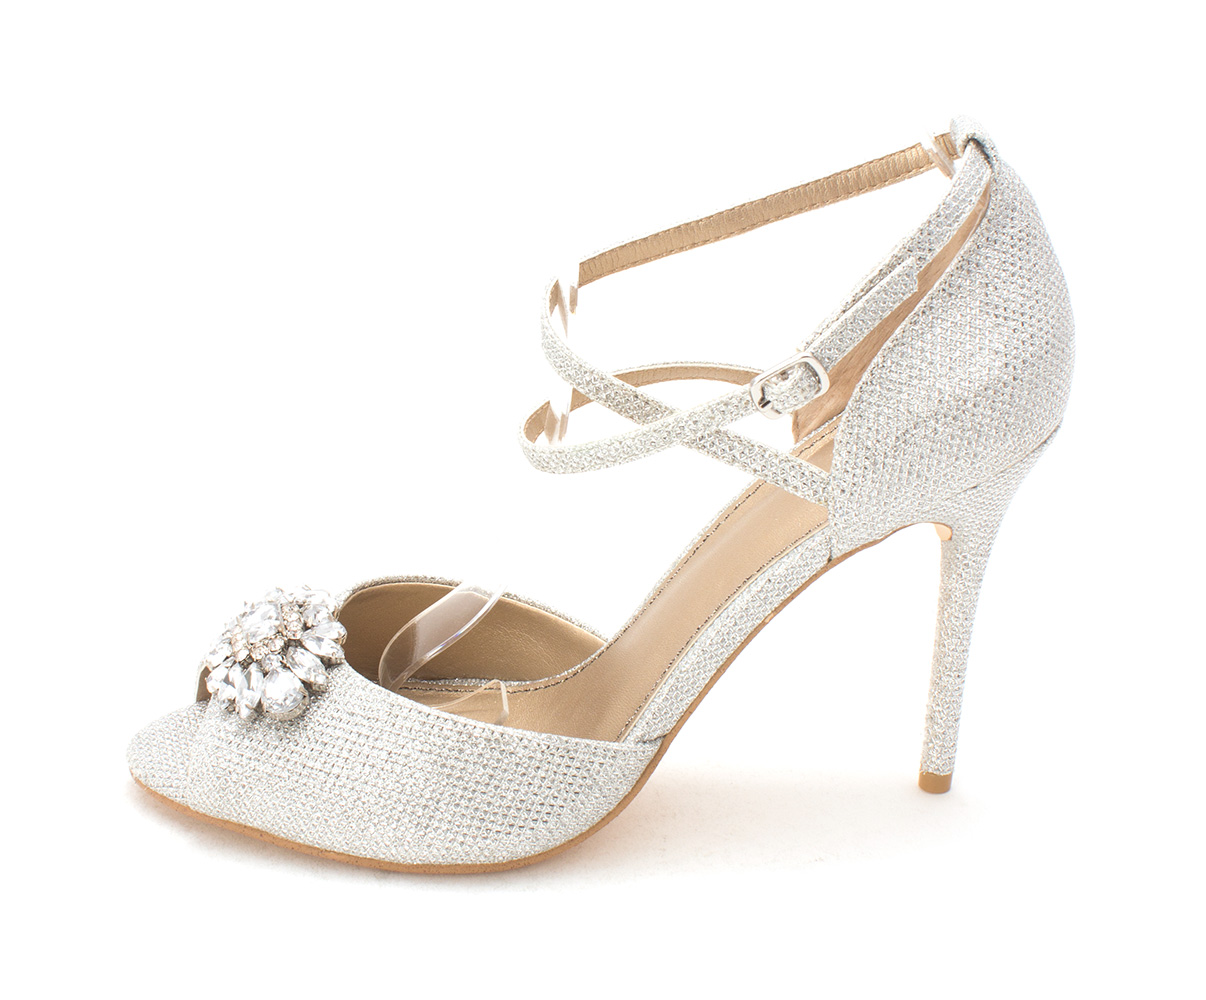 Belle Womens okra Open Toe Ankle Strap Classic Pumps silfab Size 8.0